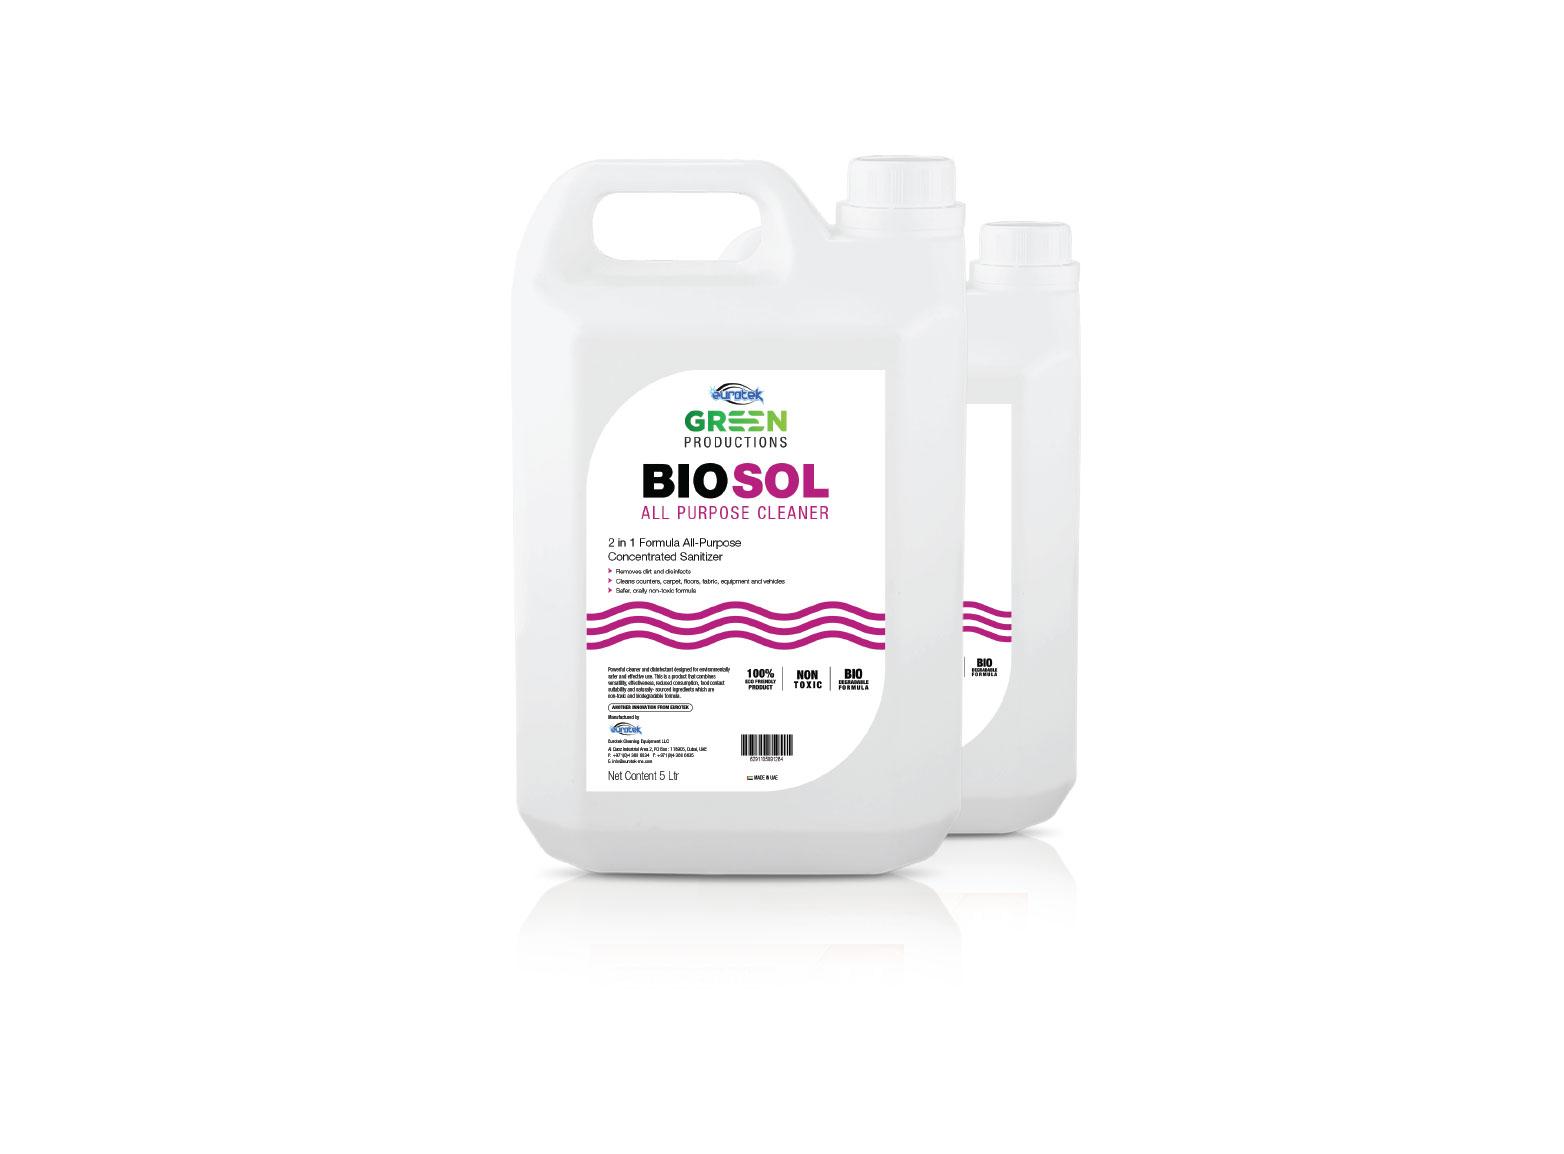 Bio Sol Green Products Eurotek